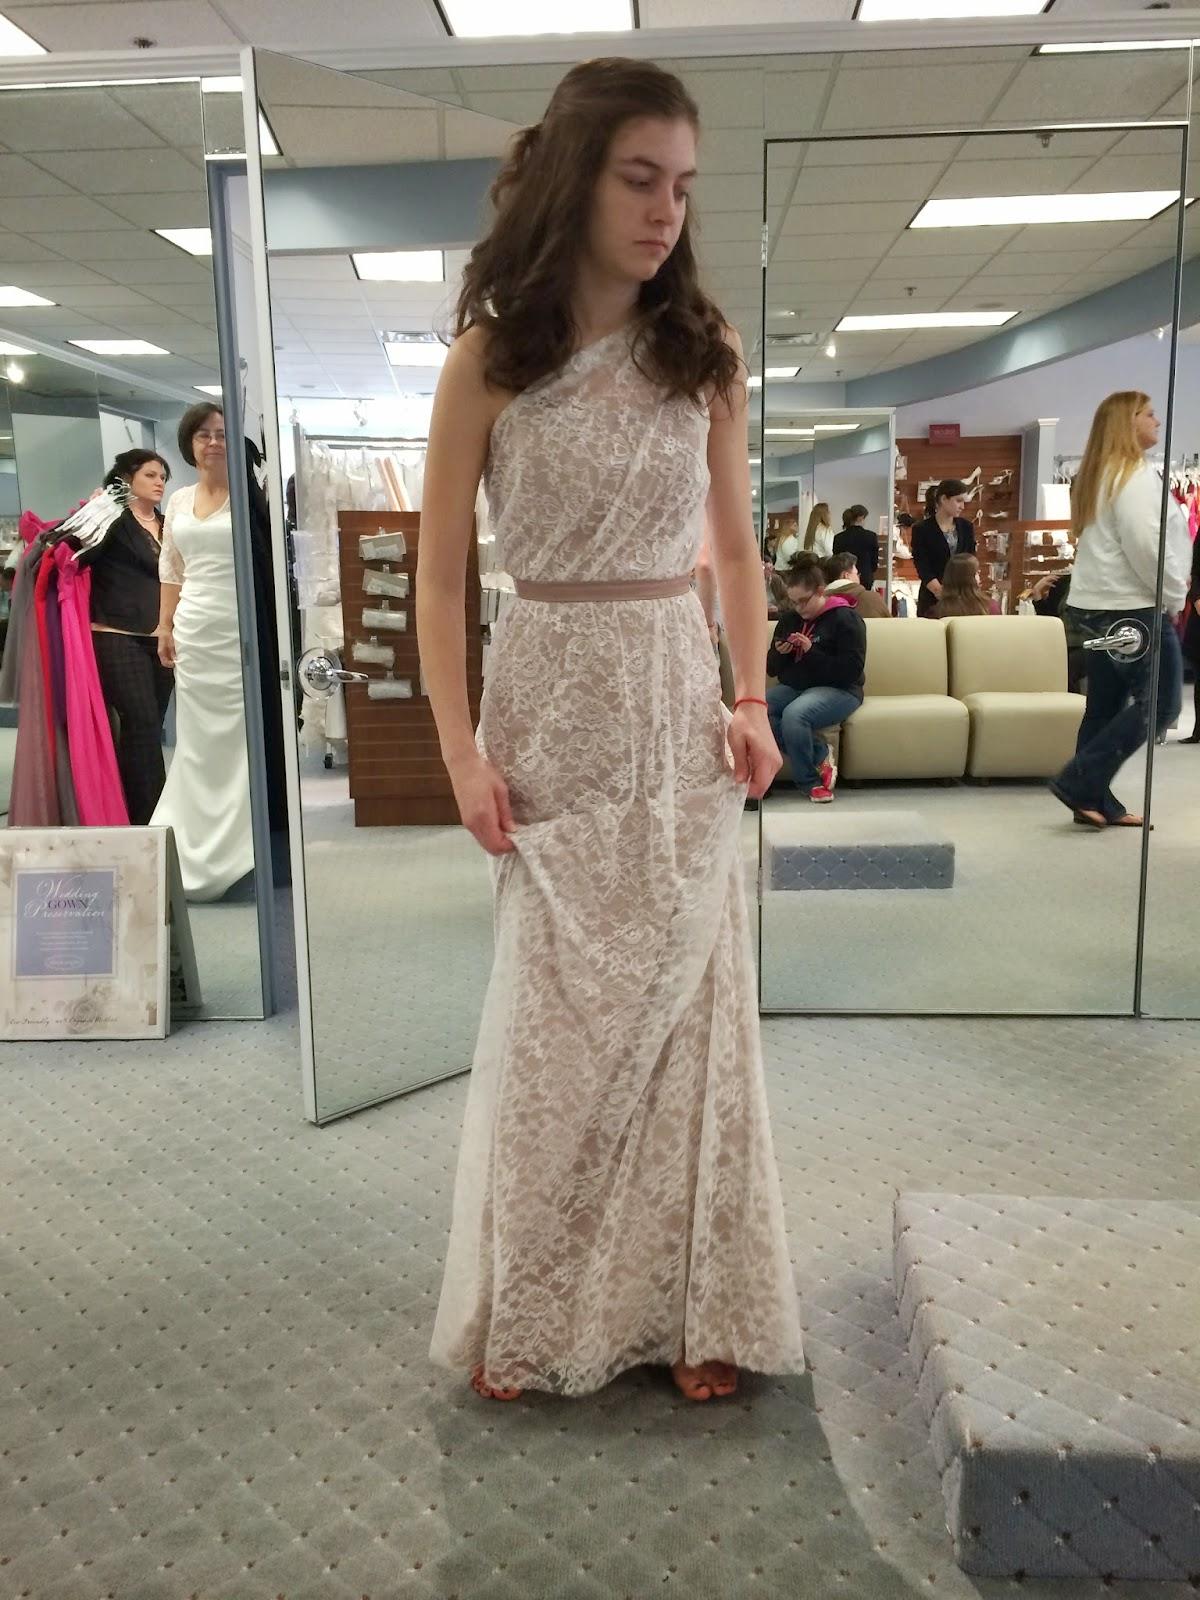 Doeblerghini Bunch:  Bridesmaid Dresses - Long Lace Overlay